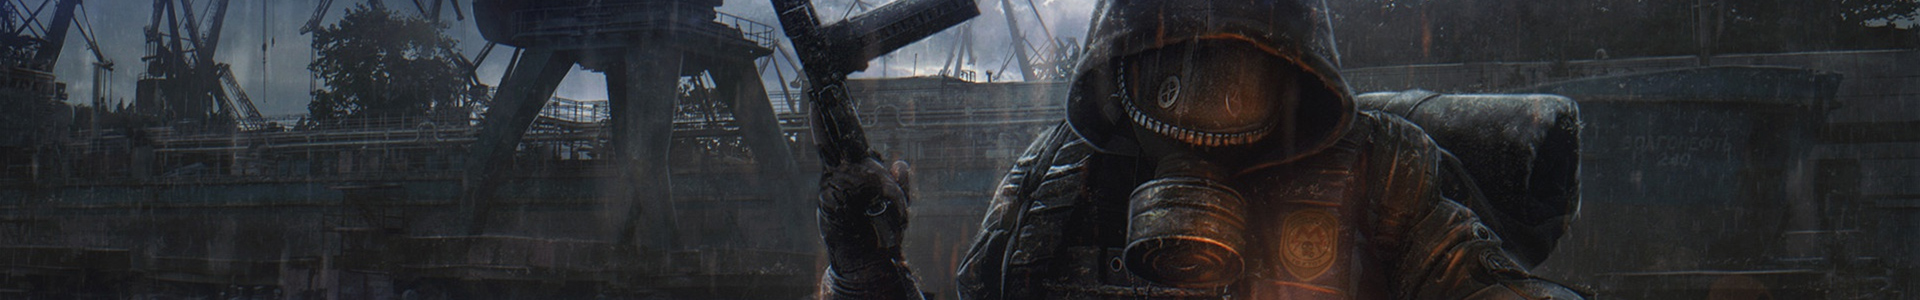 Banner media of Metro Exodus video game.